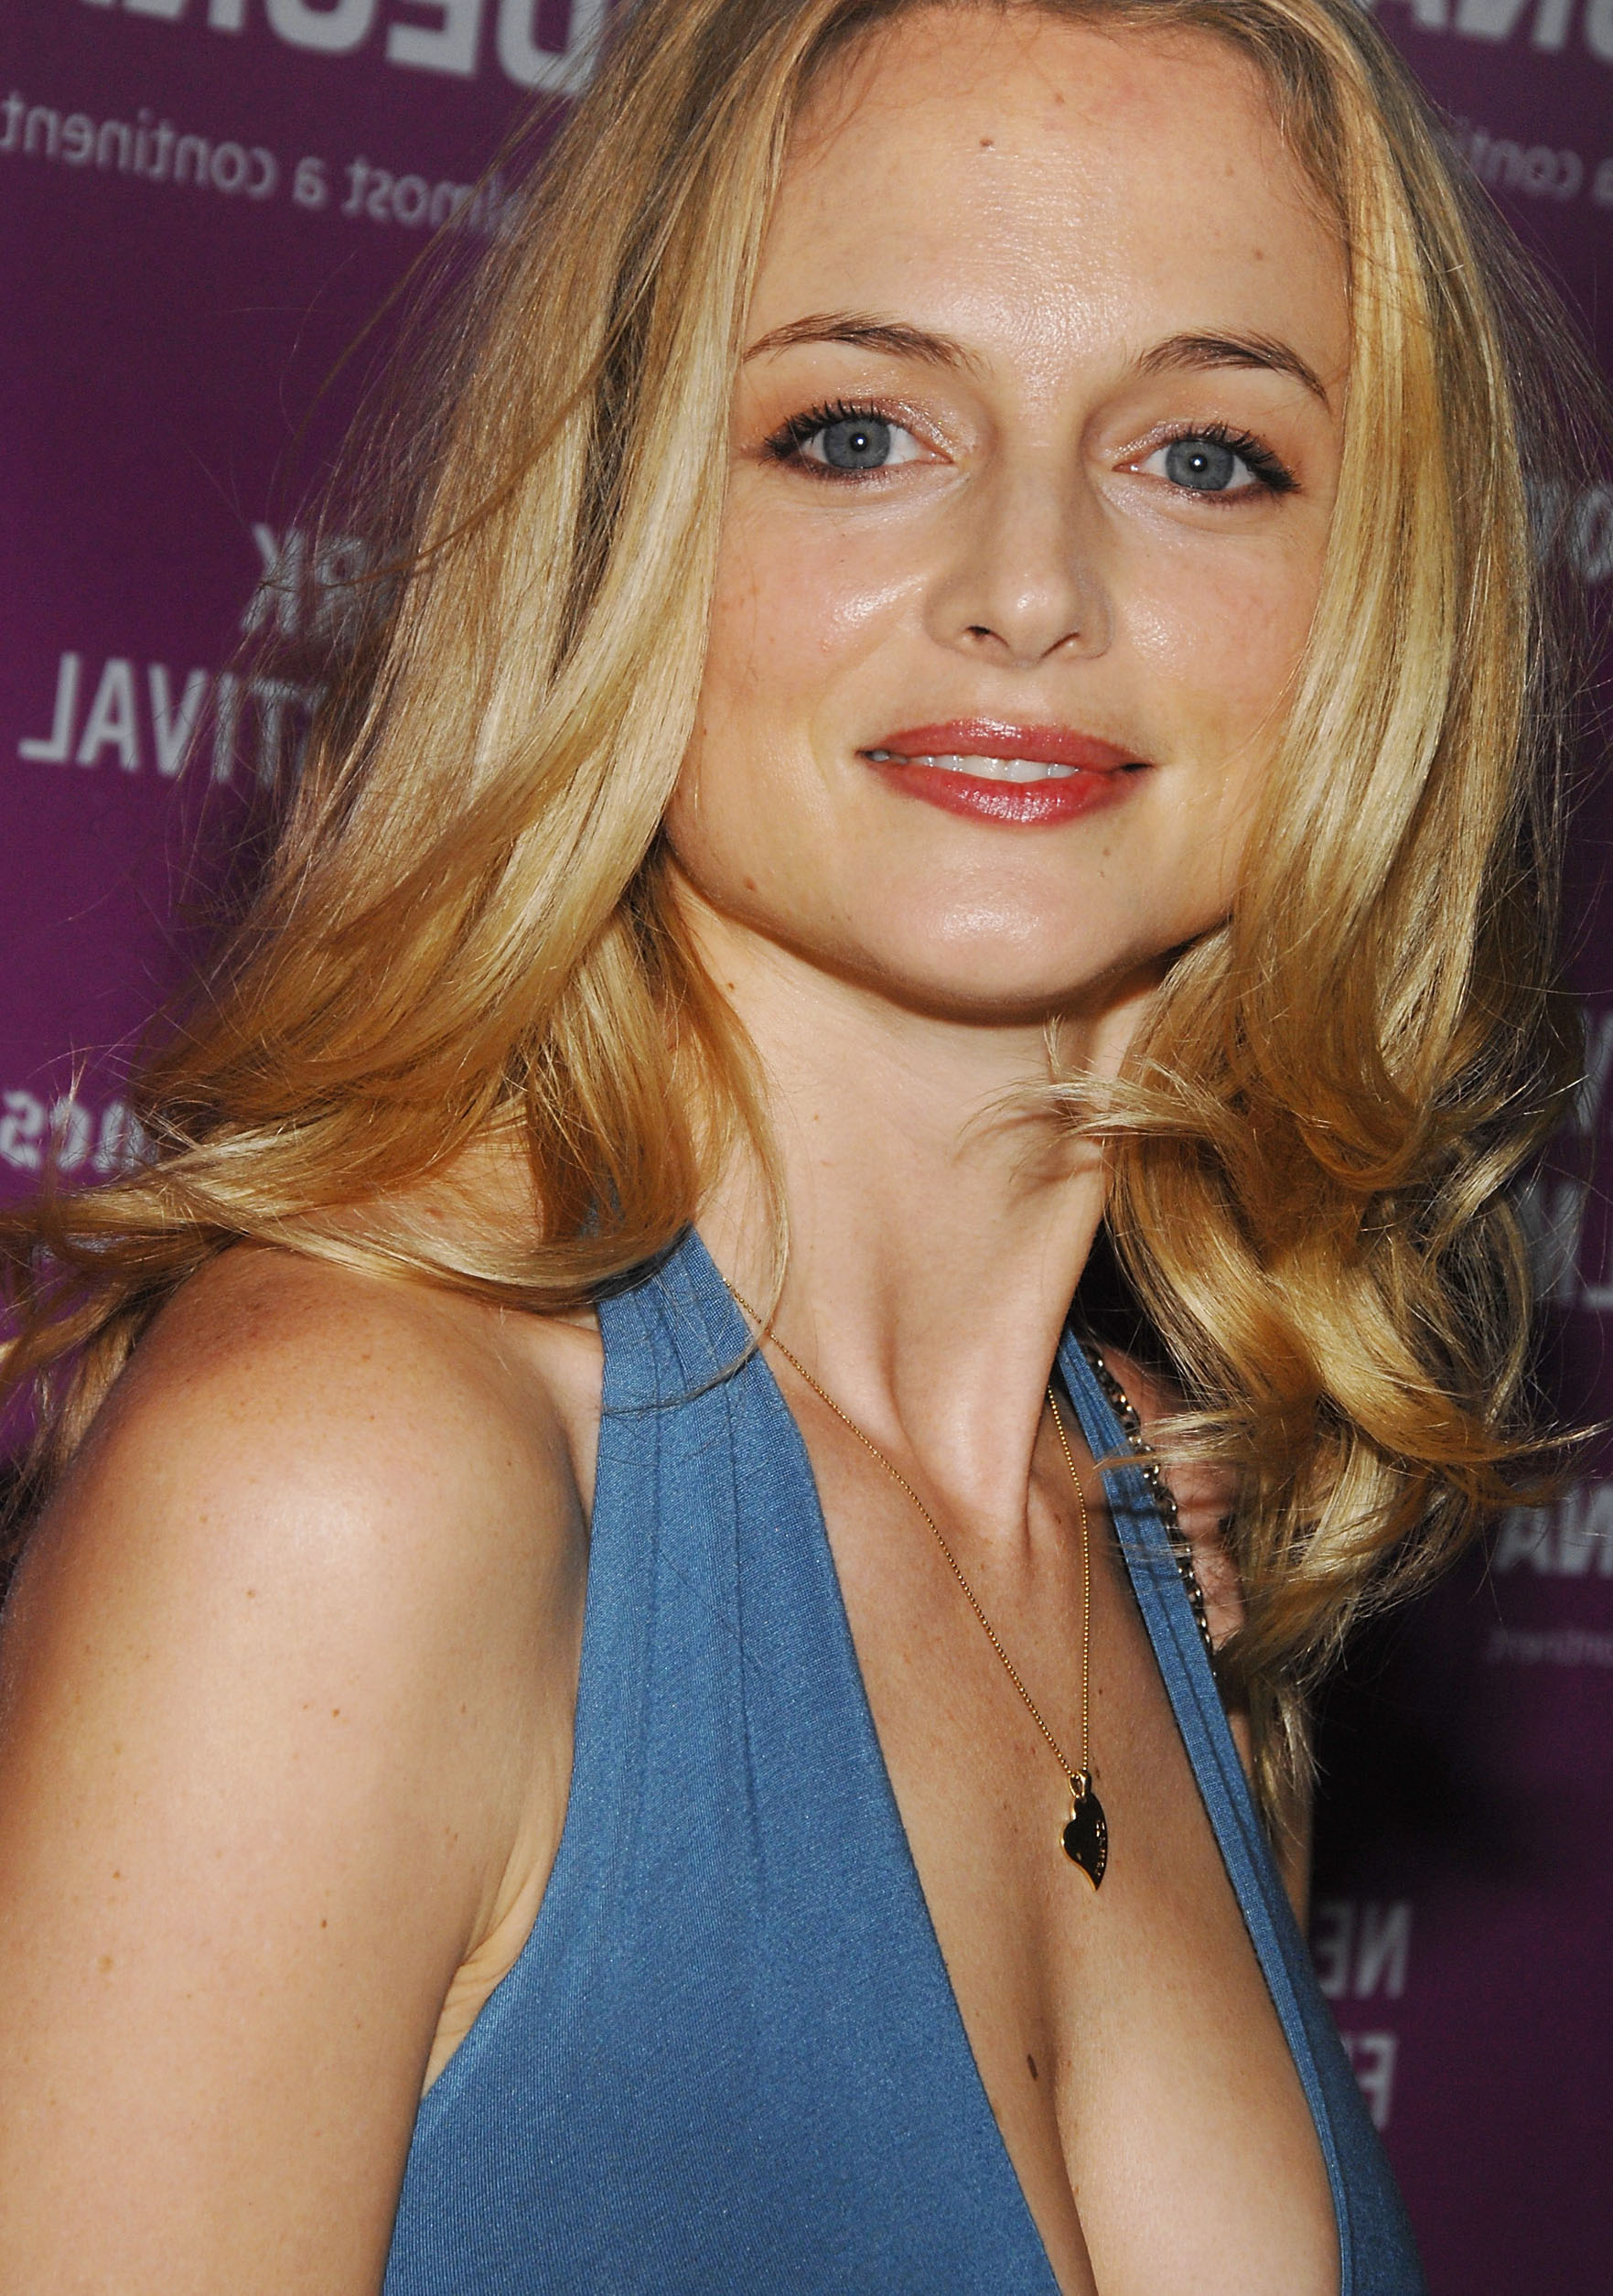 Clip Movie Actress Heather Graham Nude Selfie -3344